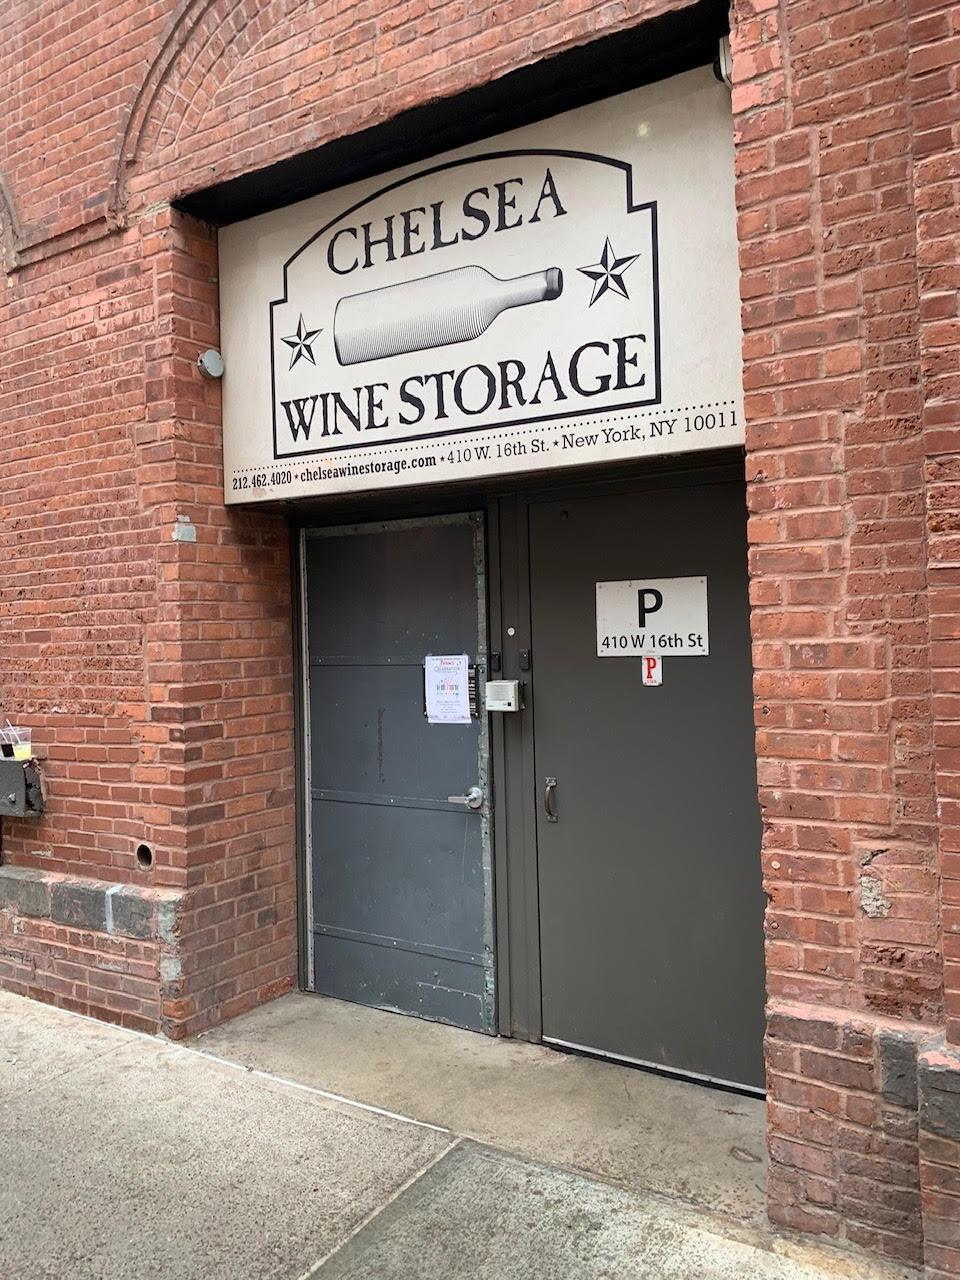 winevault_Entrance.jpg